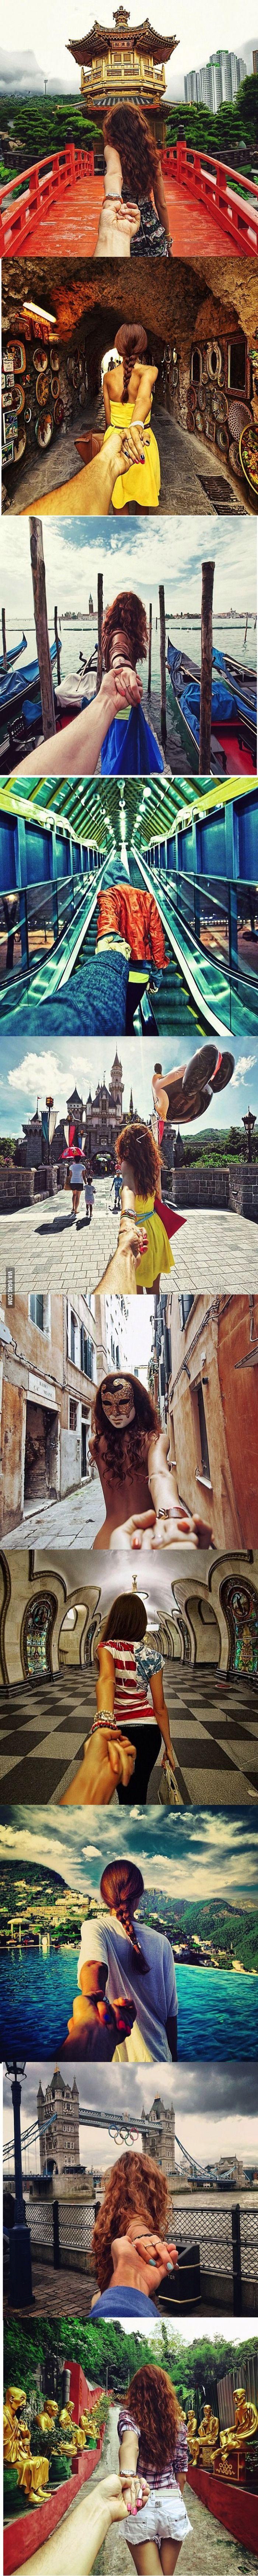 photographer's girlfriend leads him around the world - wonderful